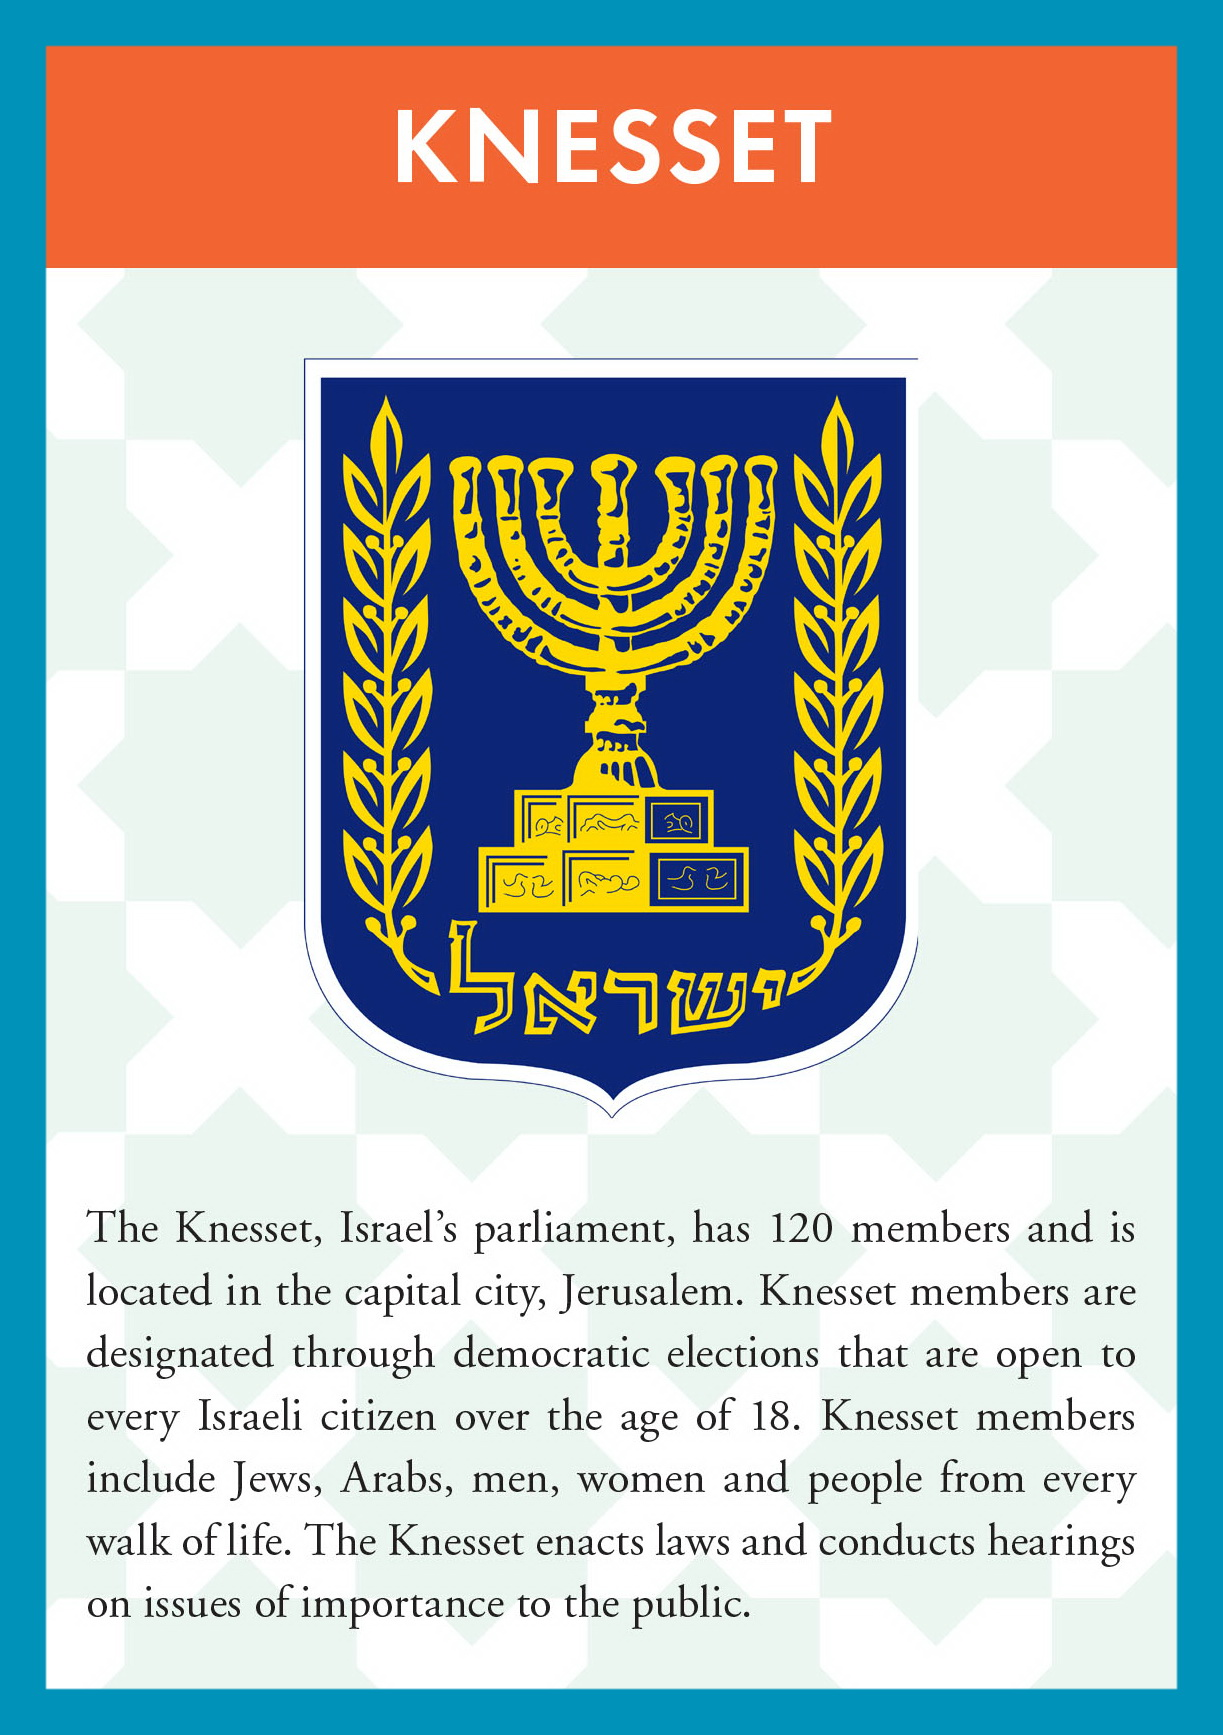 12-symbol-KNESSET-content cards